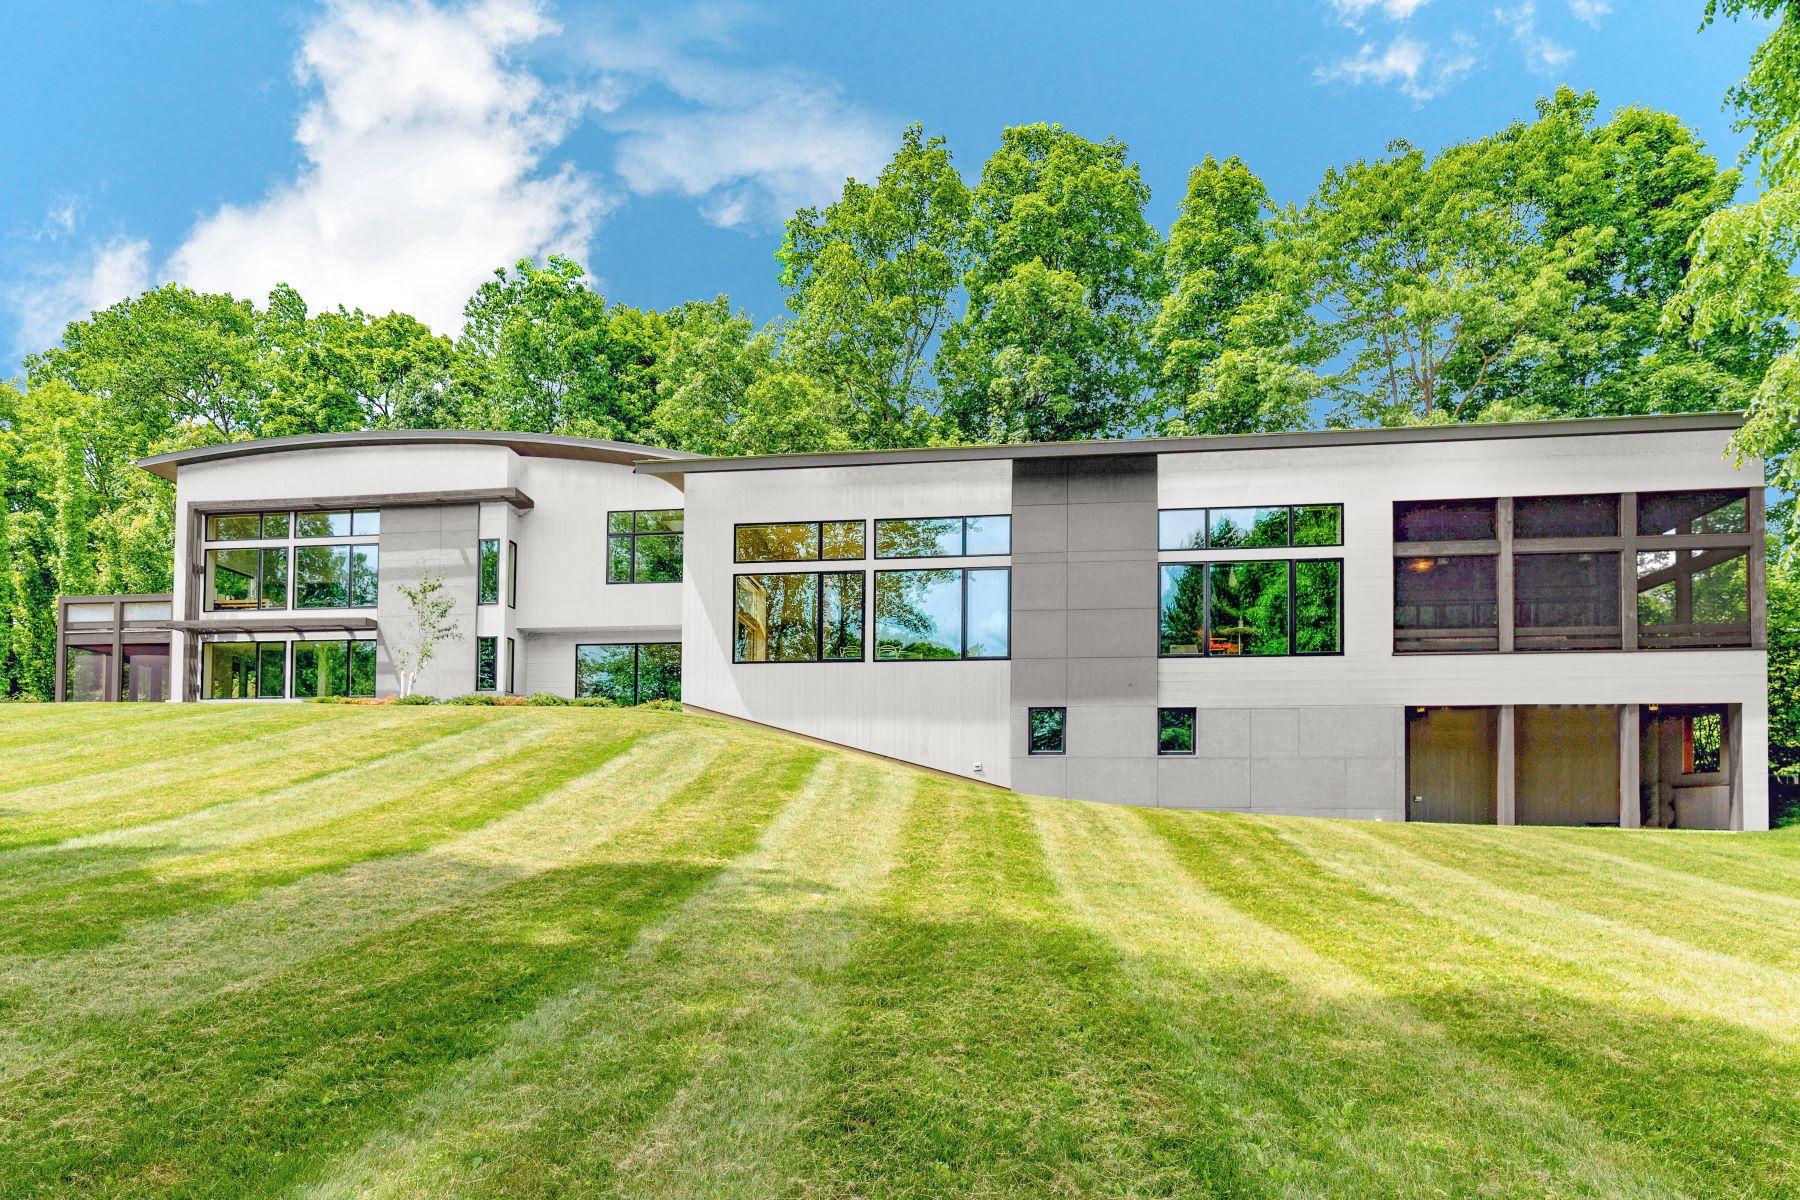 Single Family Homes for Sale at The Wexler House 157 Calhoun Street Washington, Connecticut 06794 United States